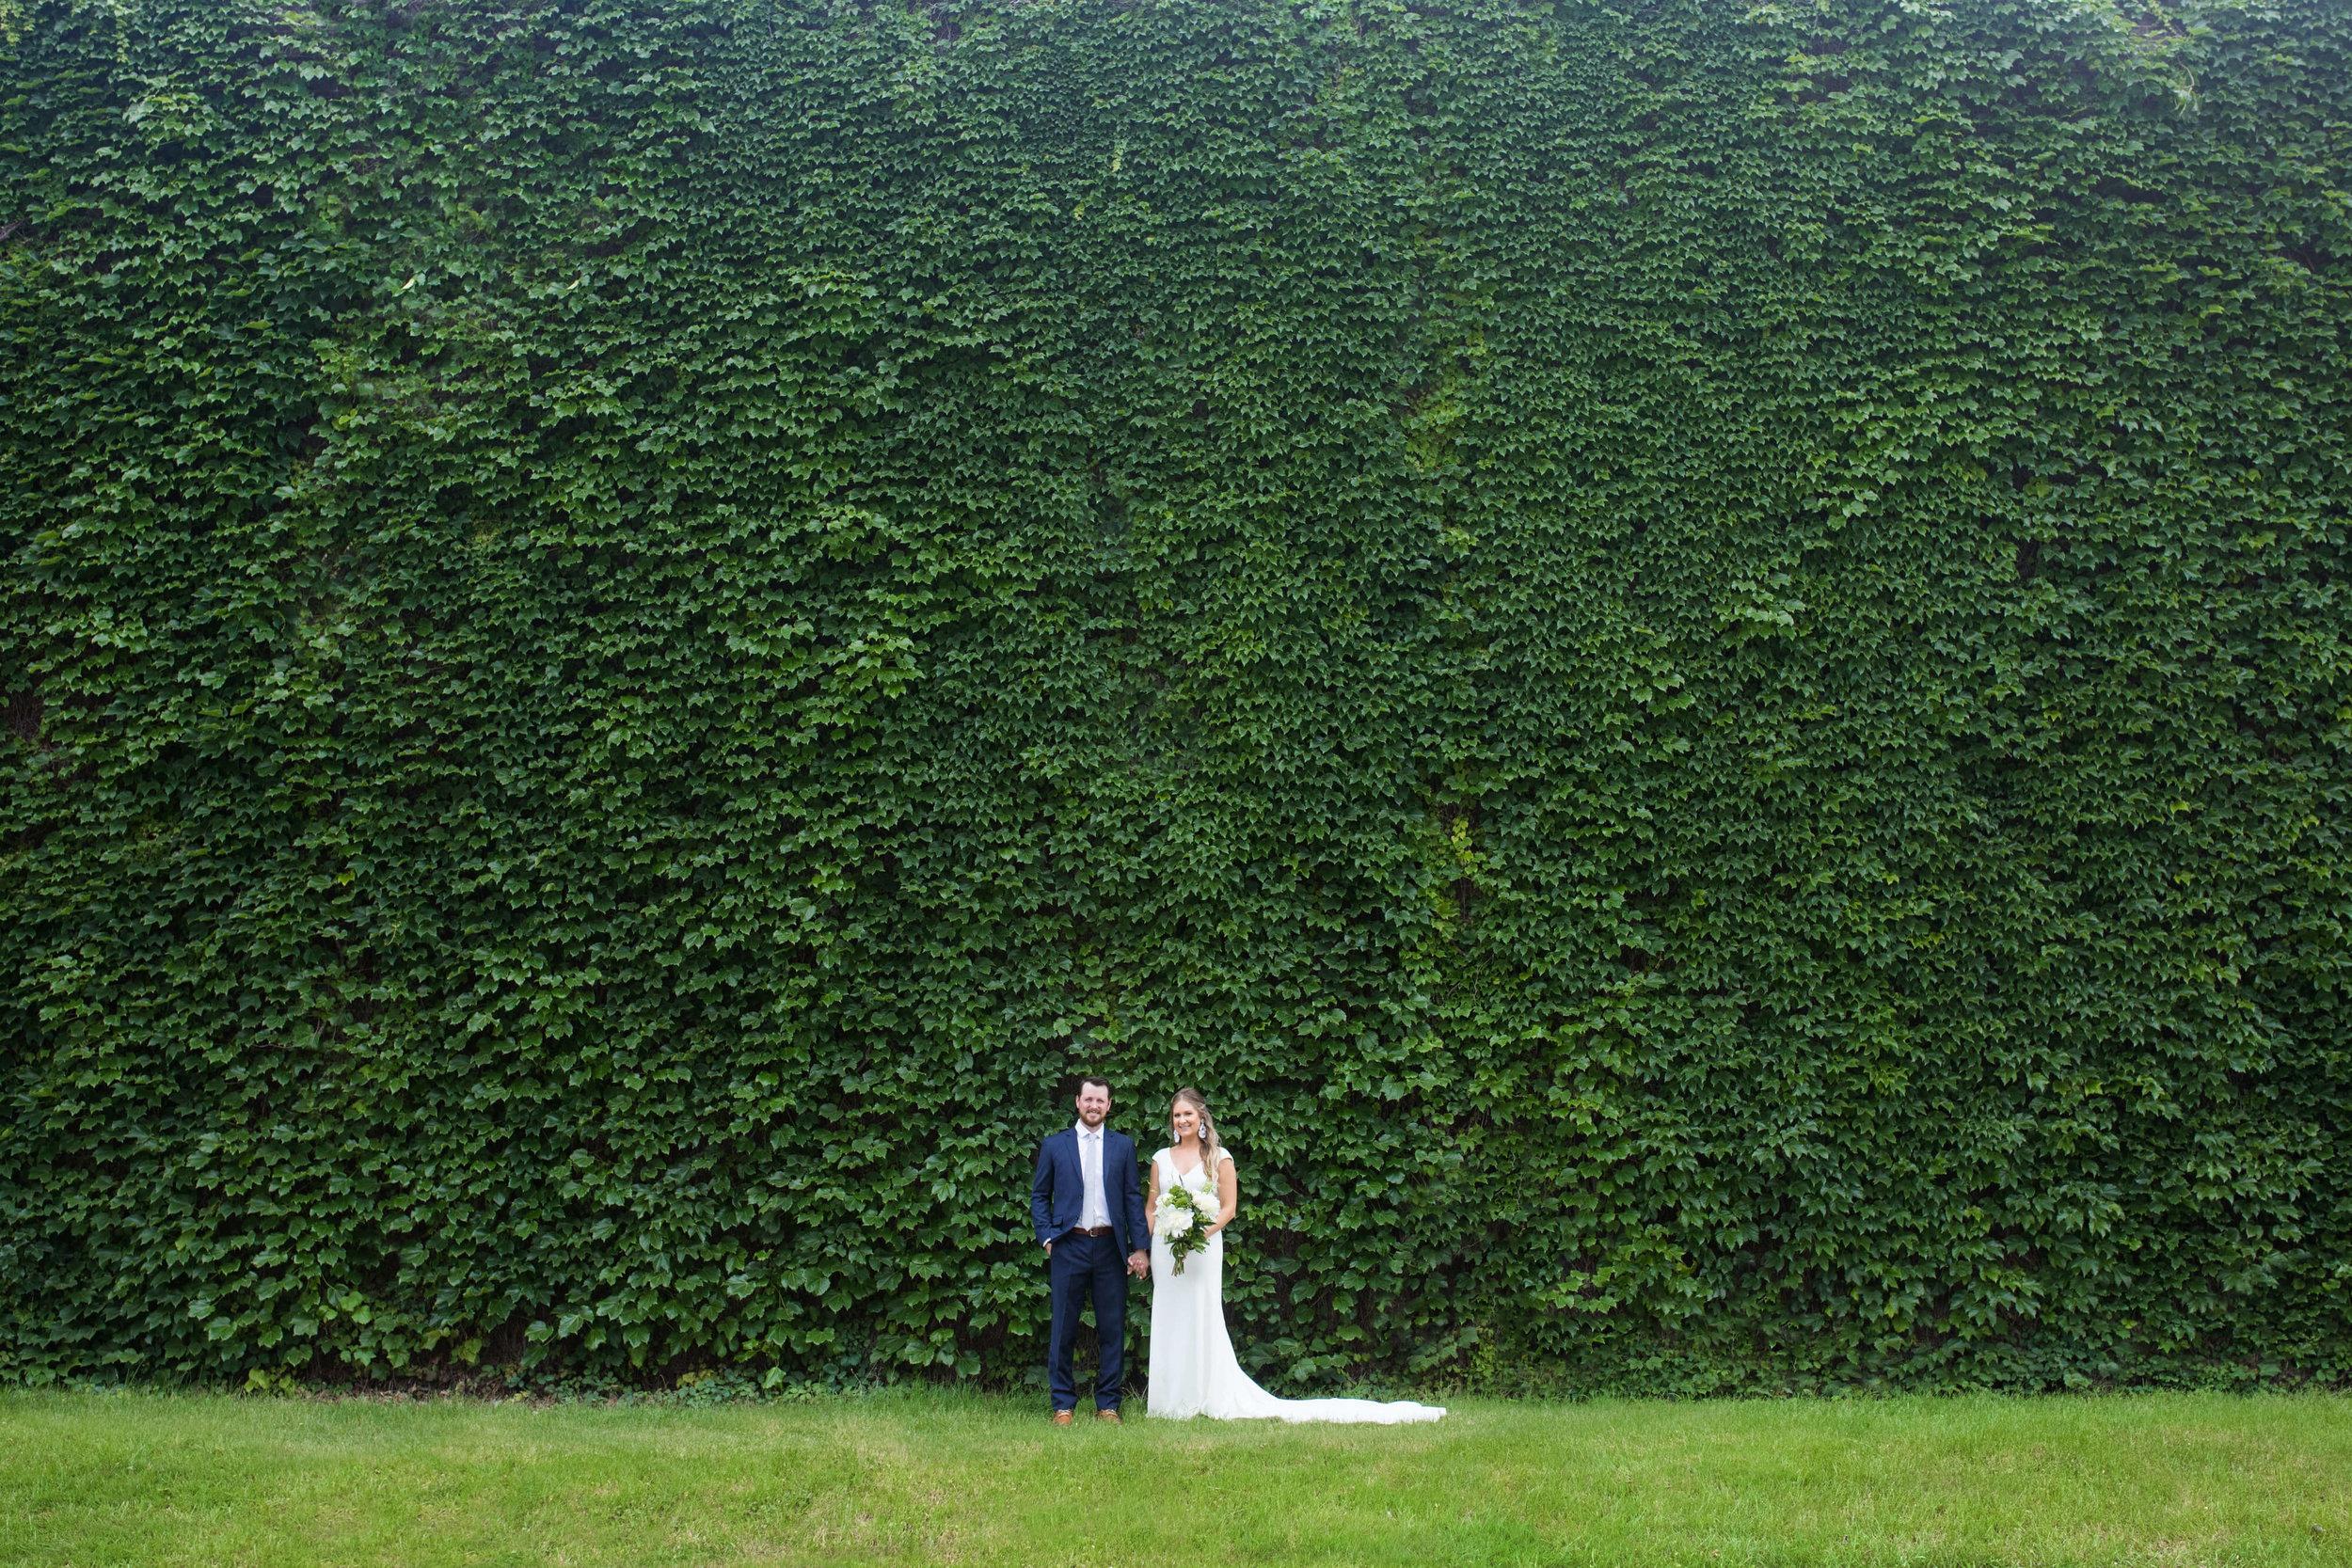 ivy wall backdrop wedding | Minnesota wedding photographer Studio KH wedding dress details | wedding blog | Sixpence Events 70 Ways to Photograph Your Wedding Dress.jpg